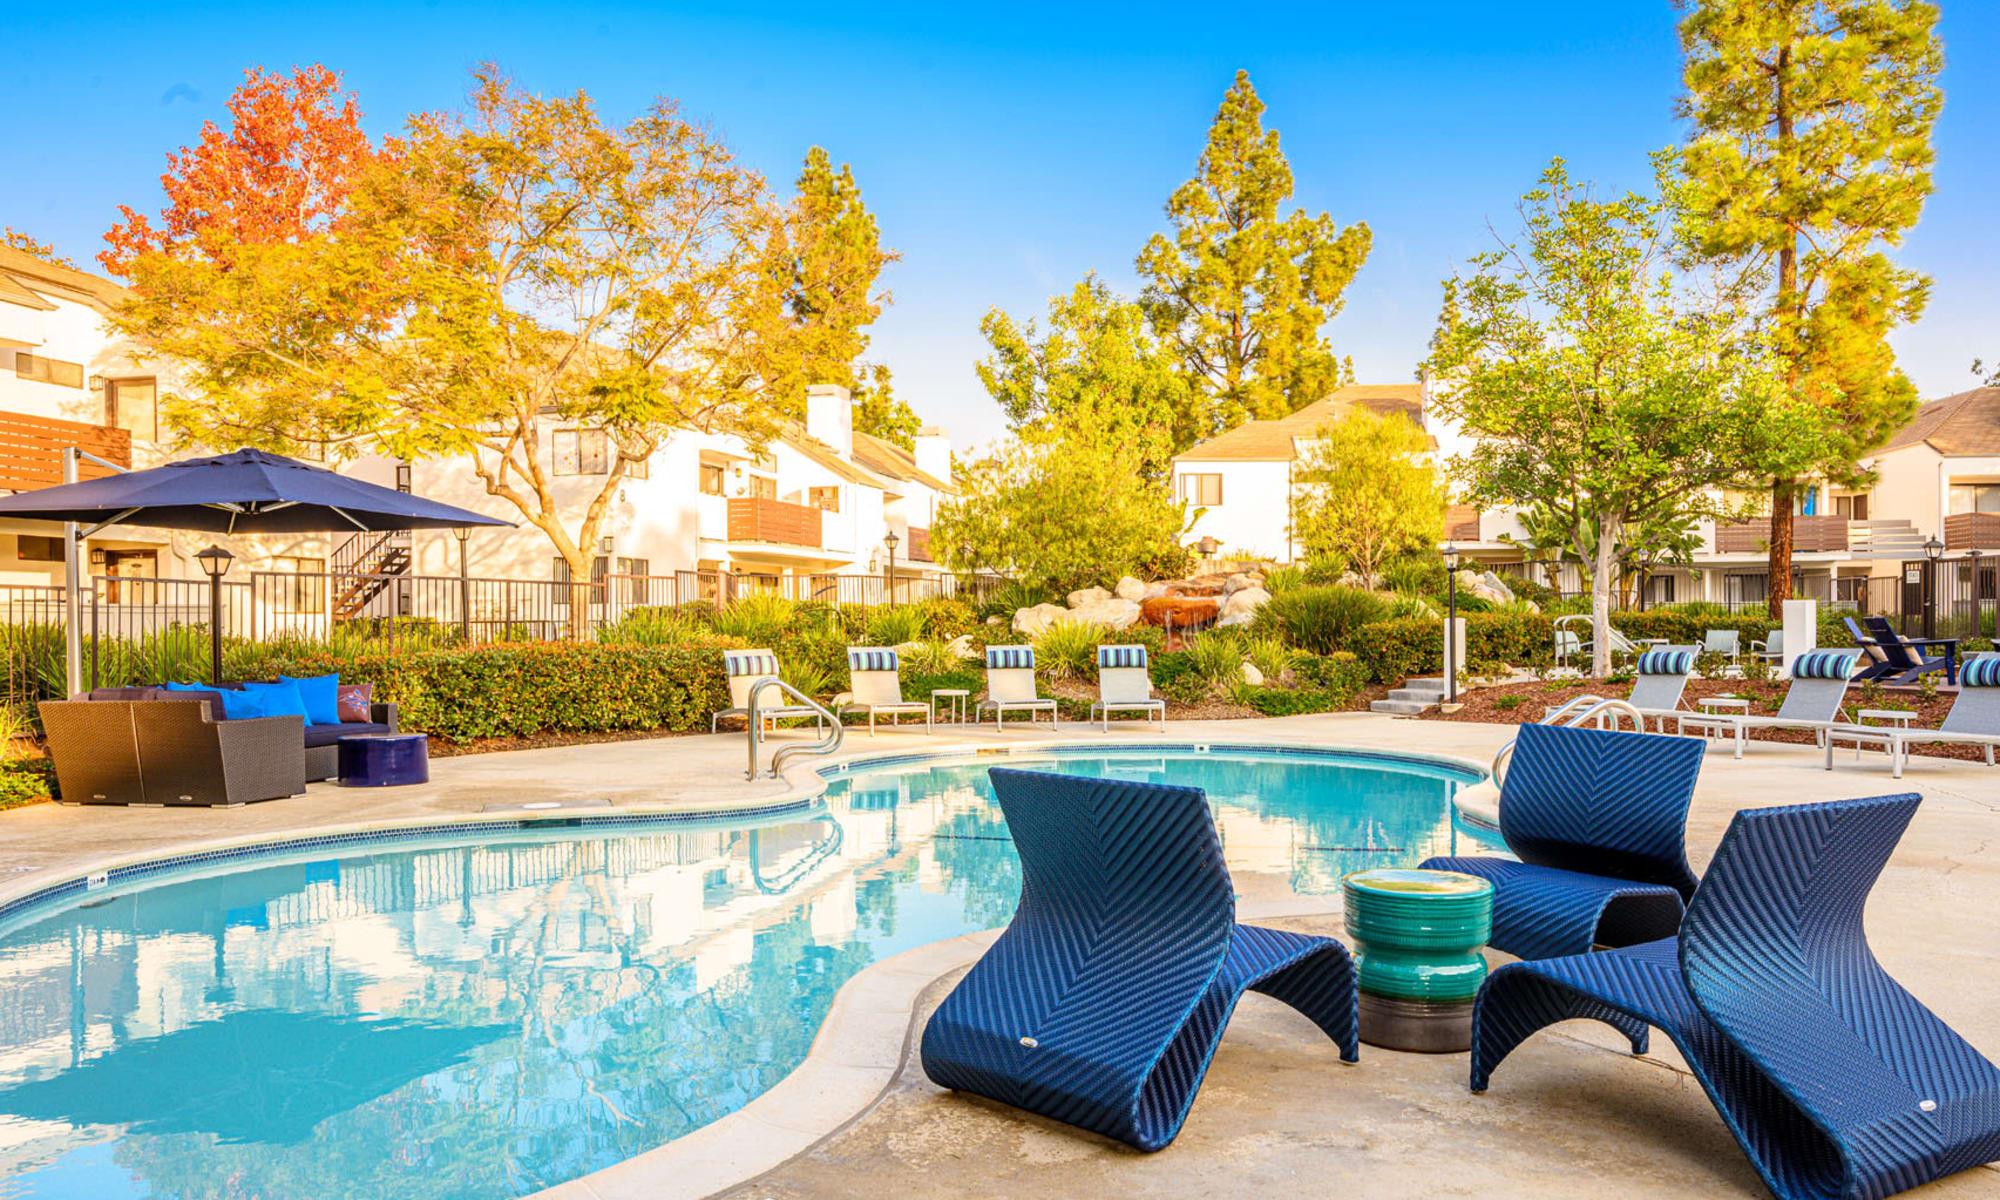 Luxurious lounge areas near the pool on a beautiful afternoon at Sendero Huntington Beach in Huntington Beach, California